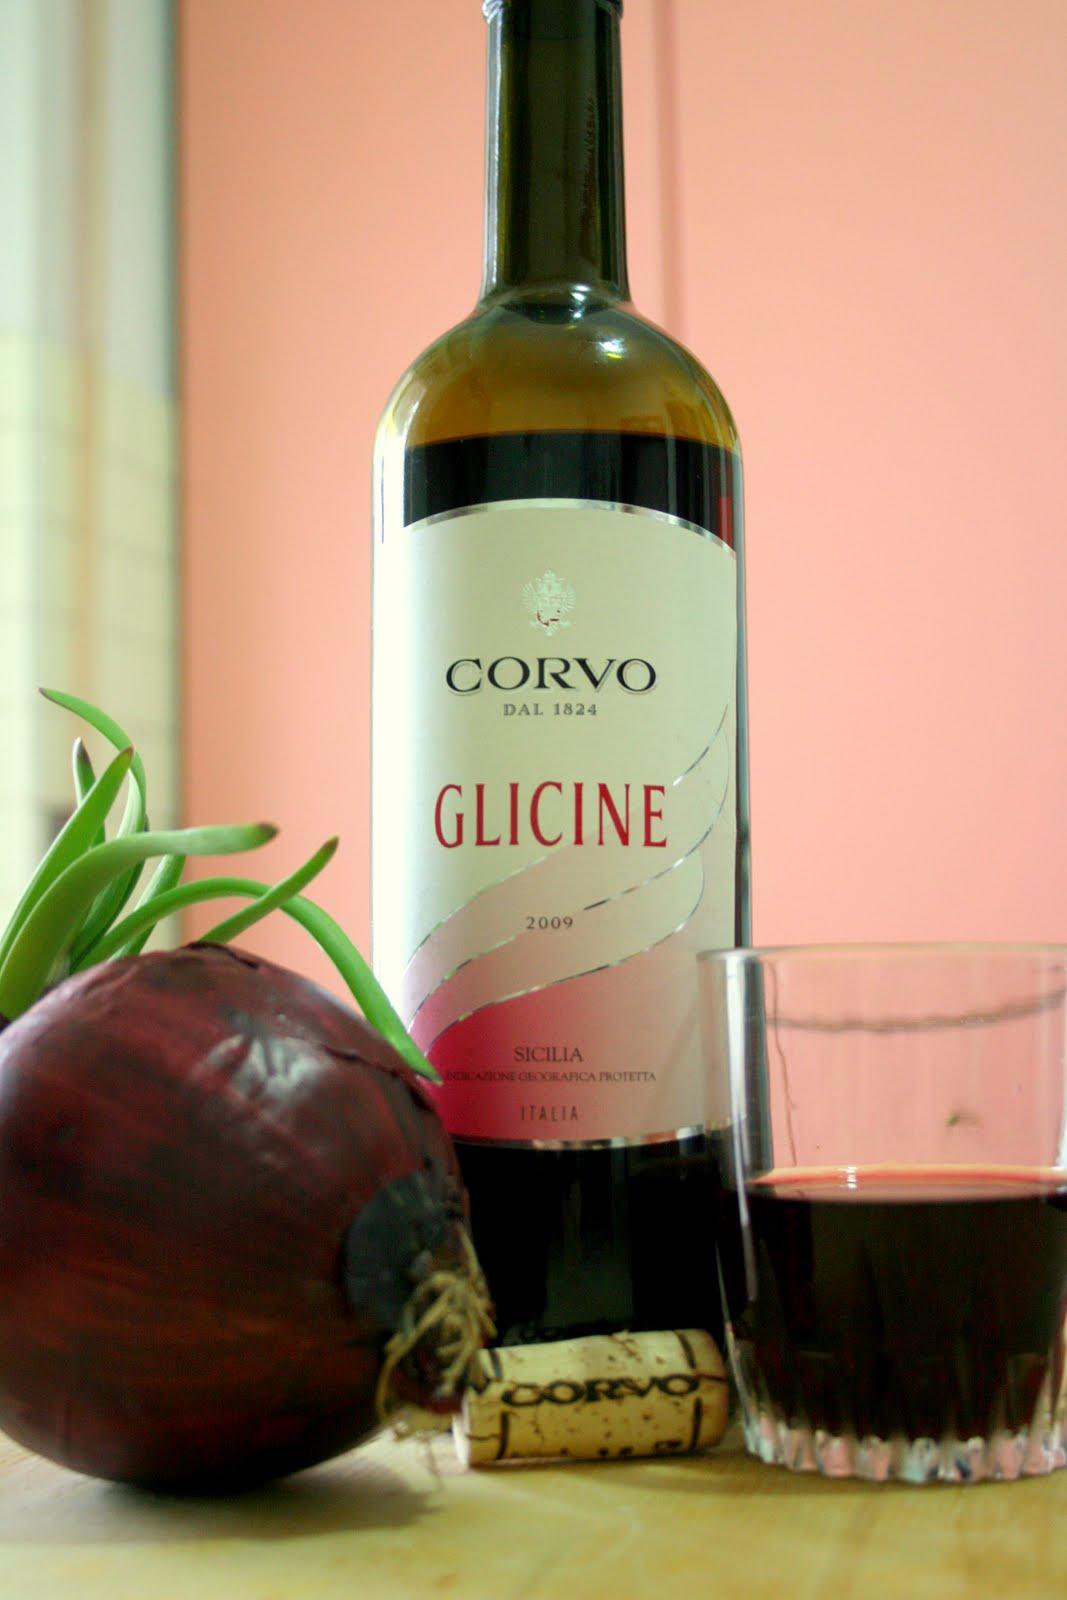 Картинка с вином глицин, открытки марта